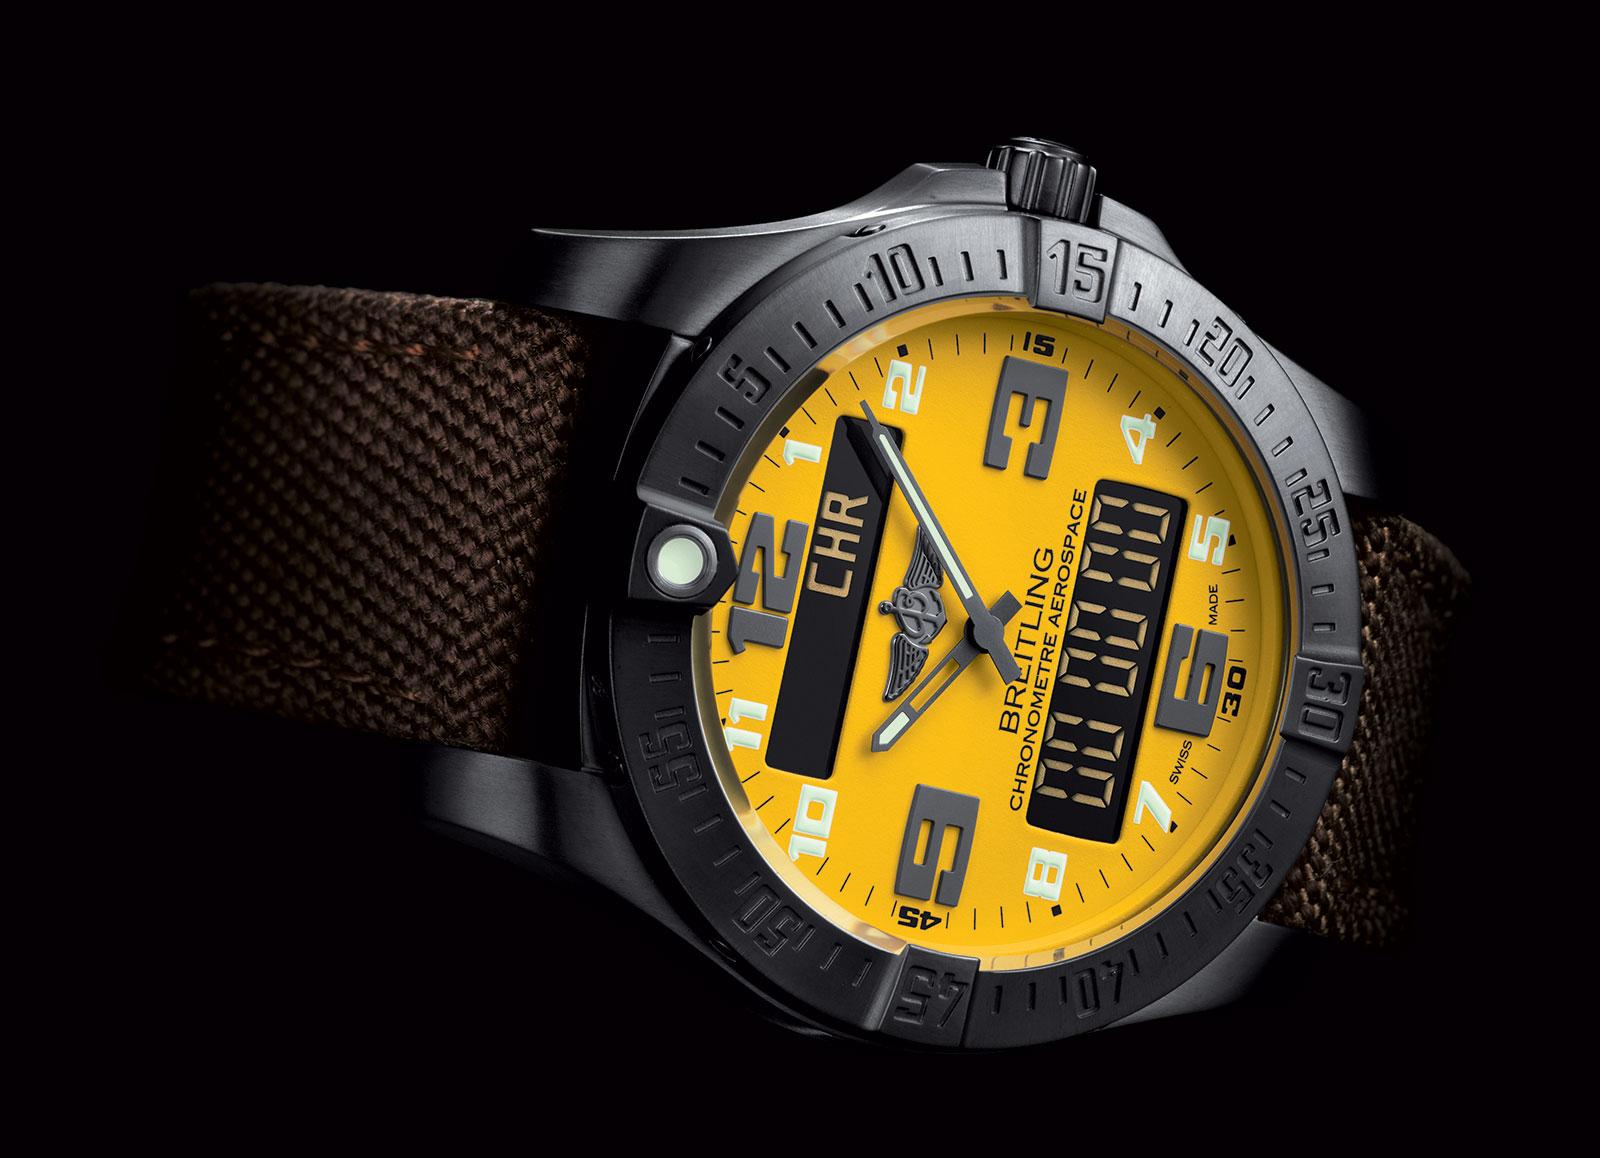 Naziv: Breitling Aerospace Evo Night Mission Yellow 2.jpg, pregleda: 304, veličina: 223,6 KB